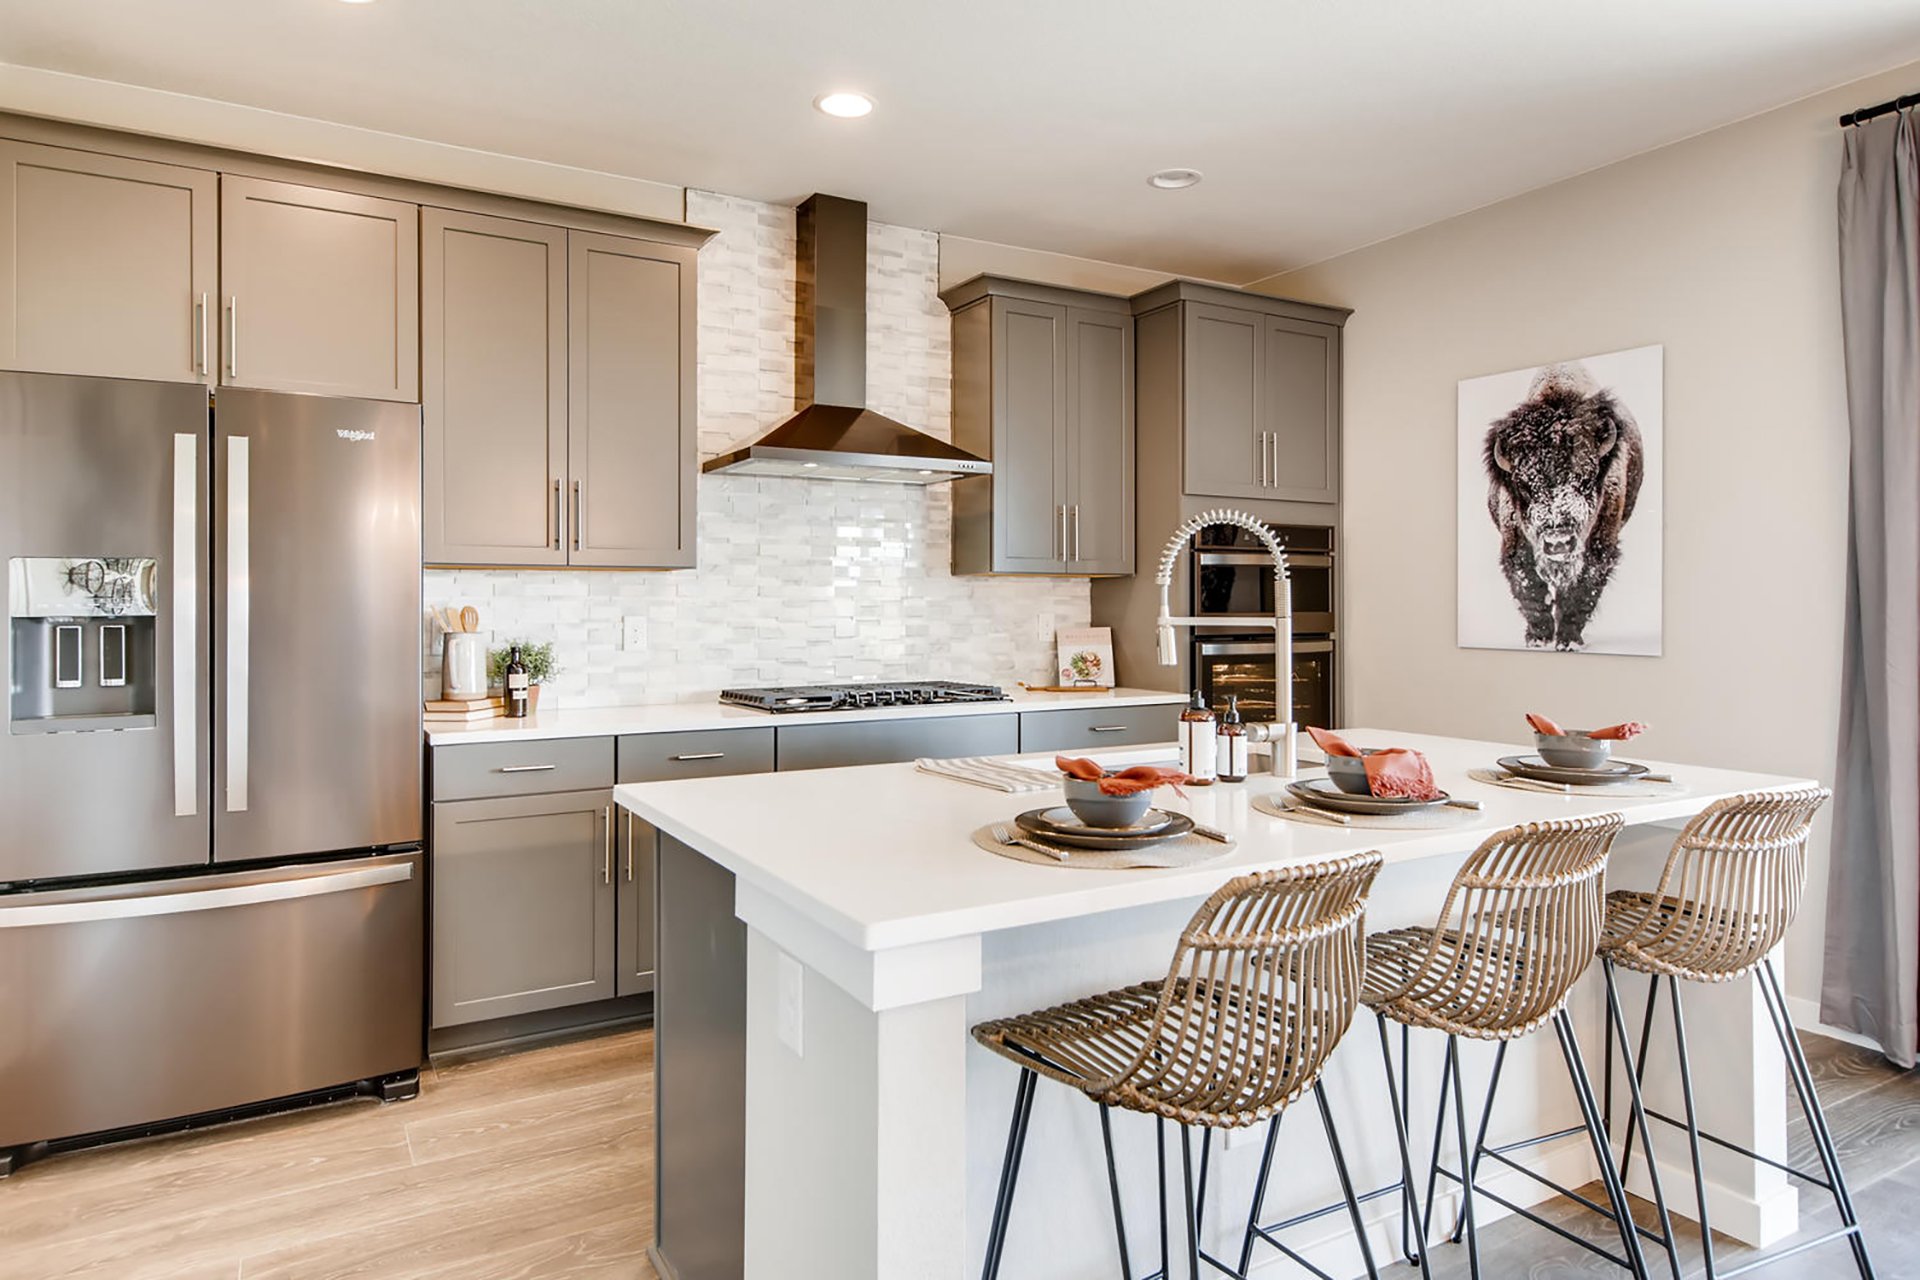 new home kitchen design trends 2021